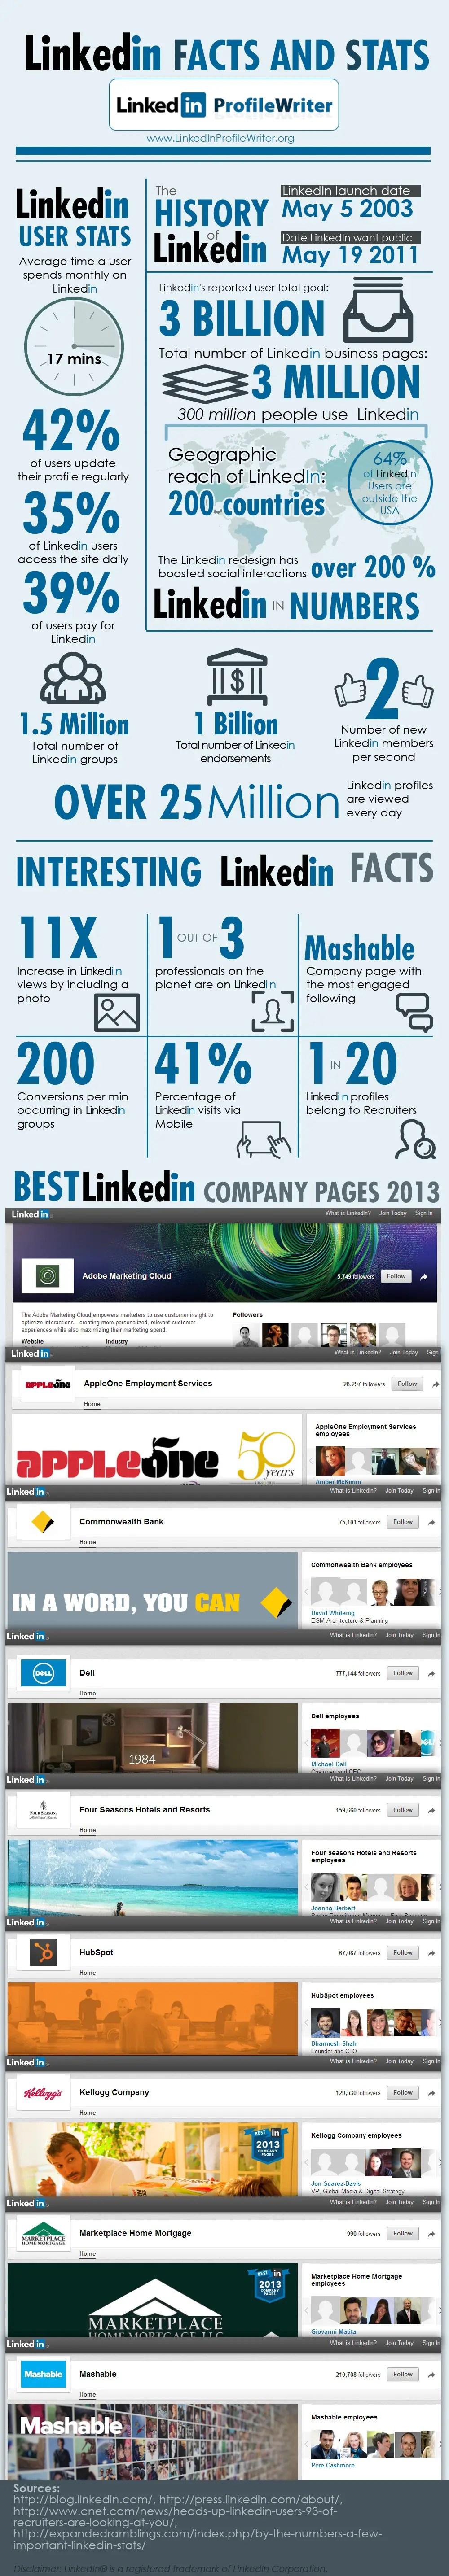 wersm_linkedin_infographic_stats_facts